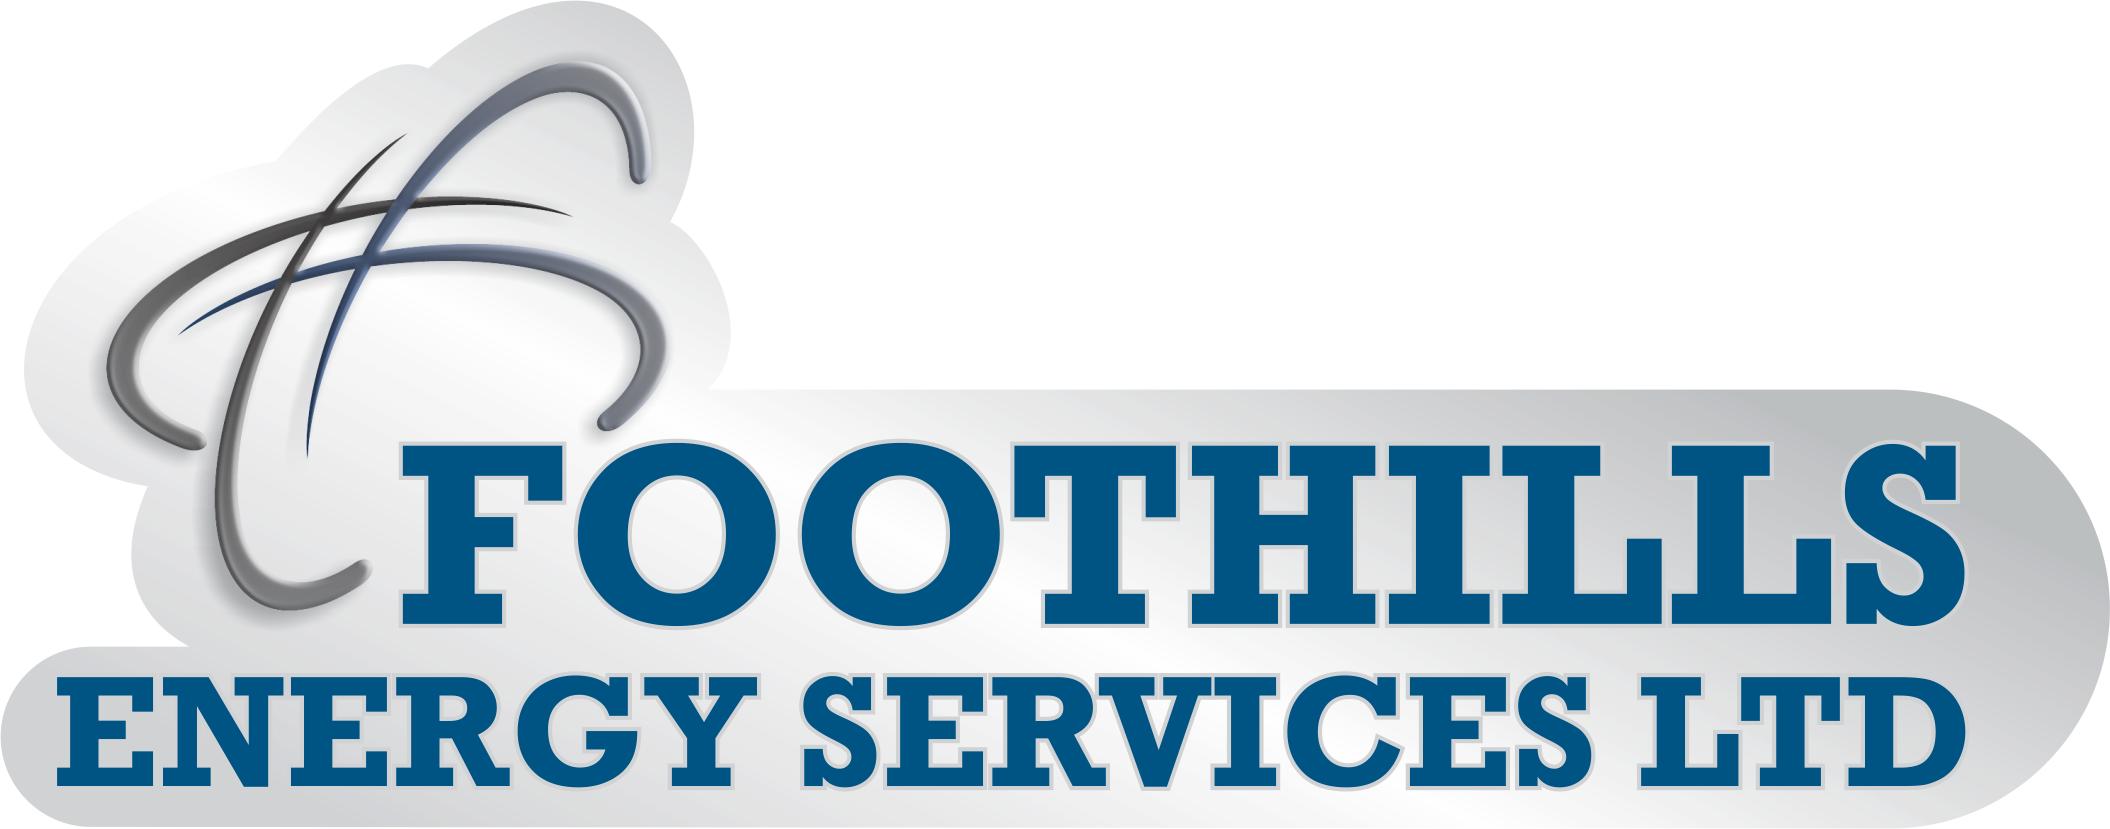 Foothills Energy Services Ltd logo